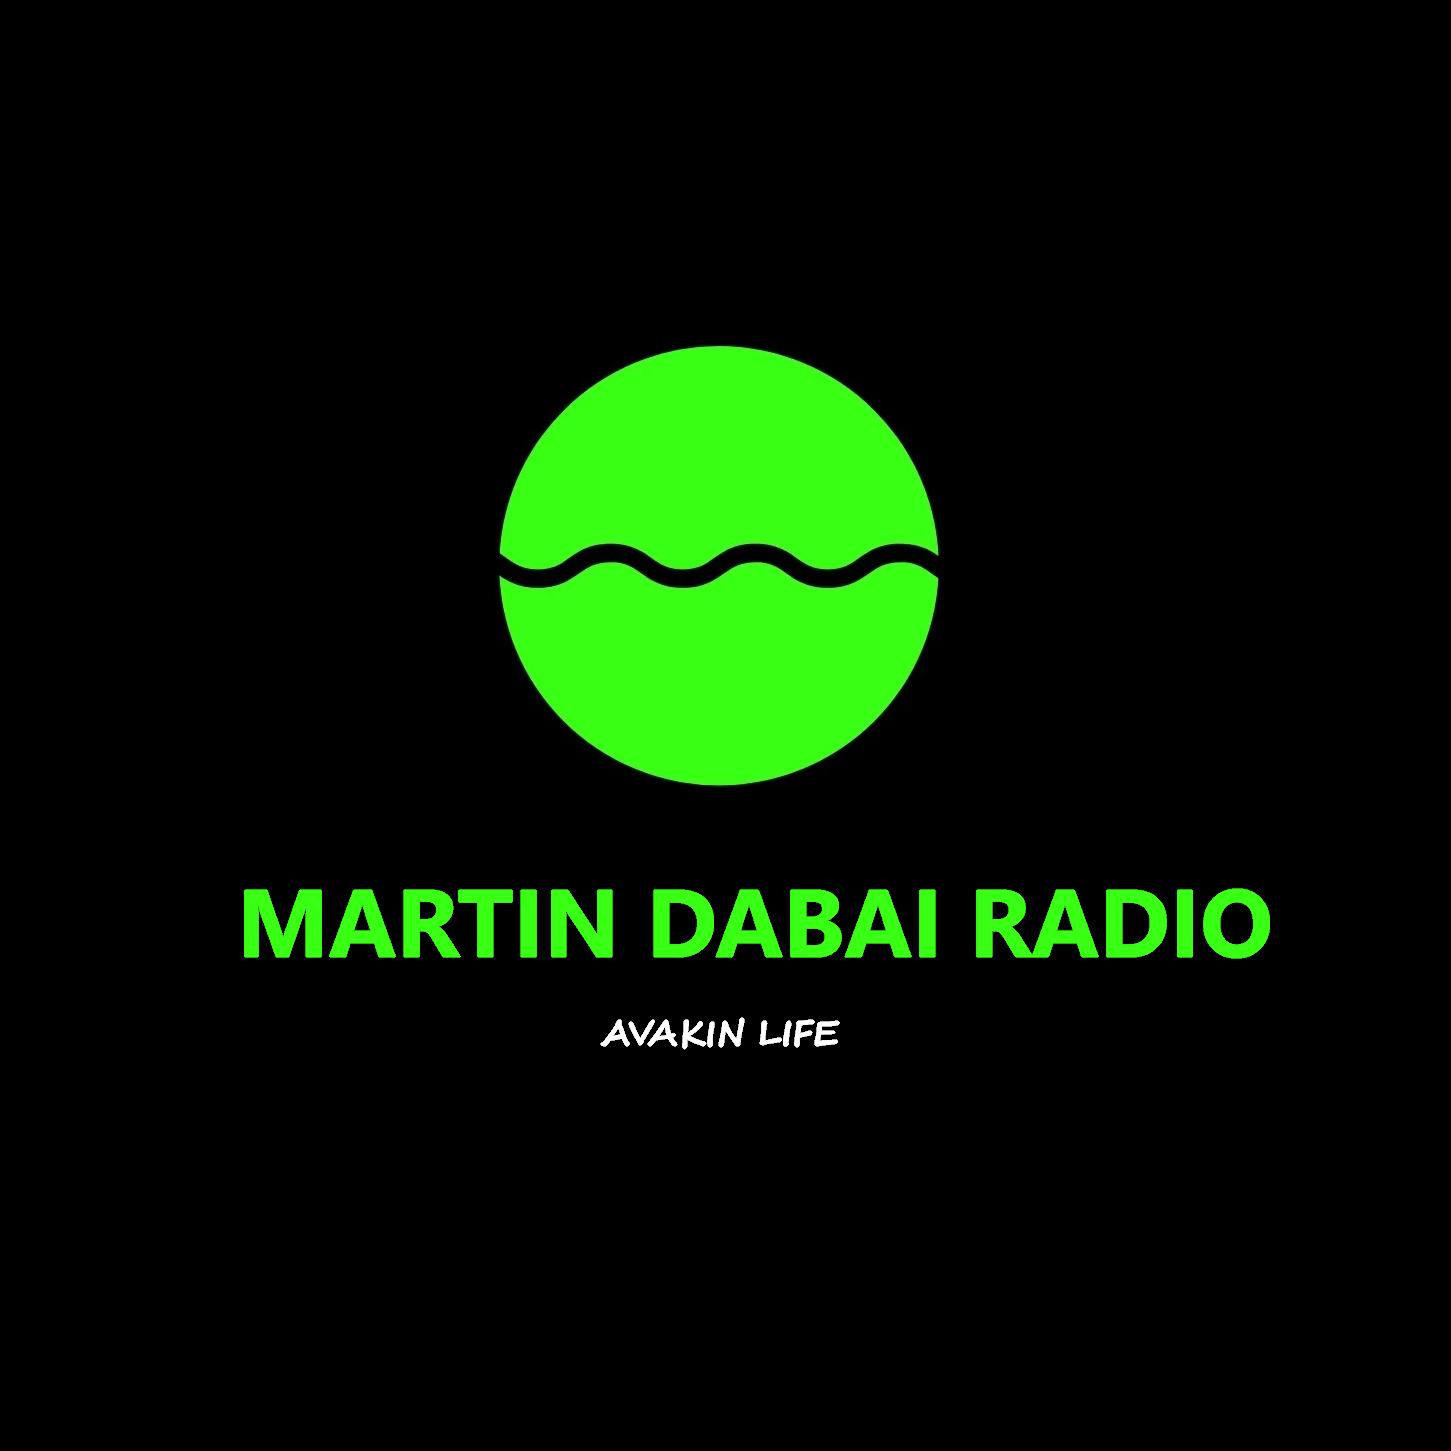 Martin Dabai Radio Station